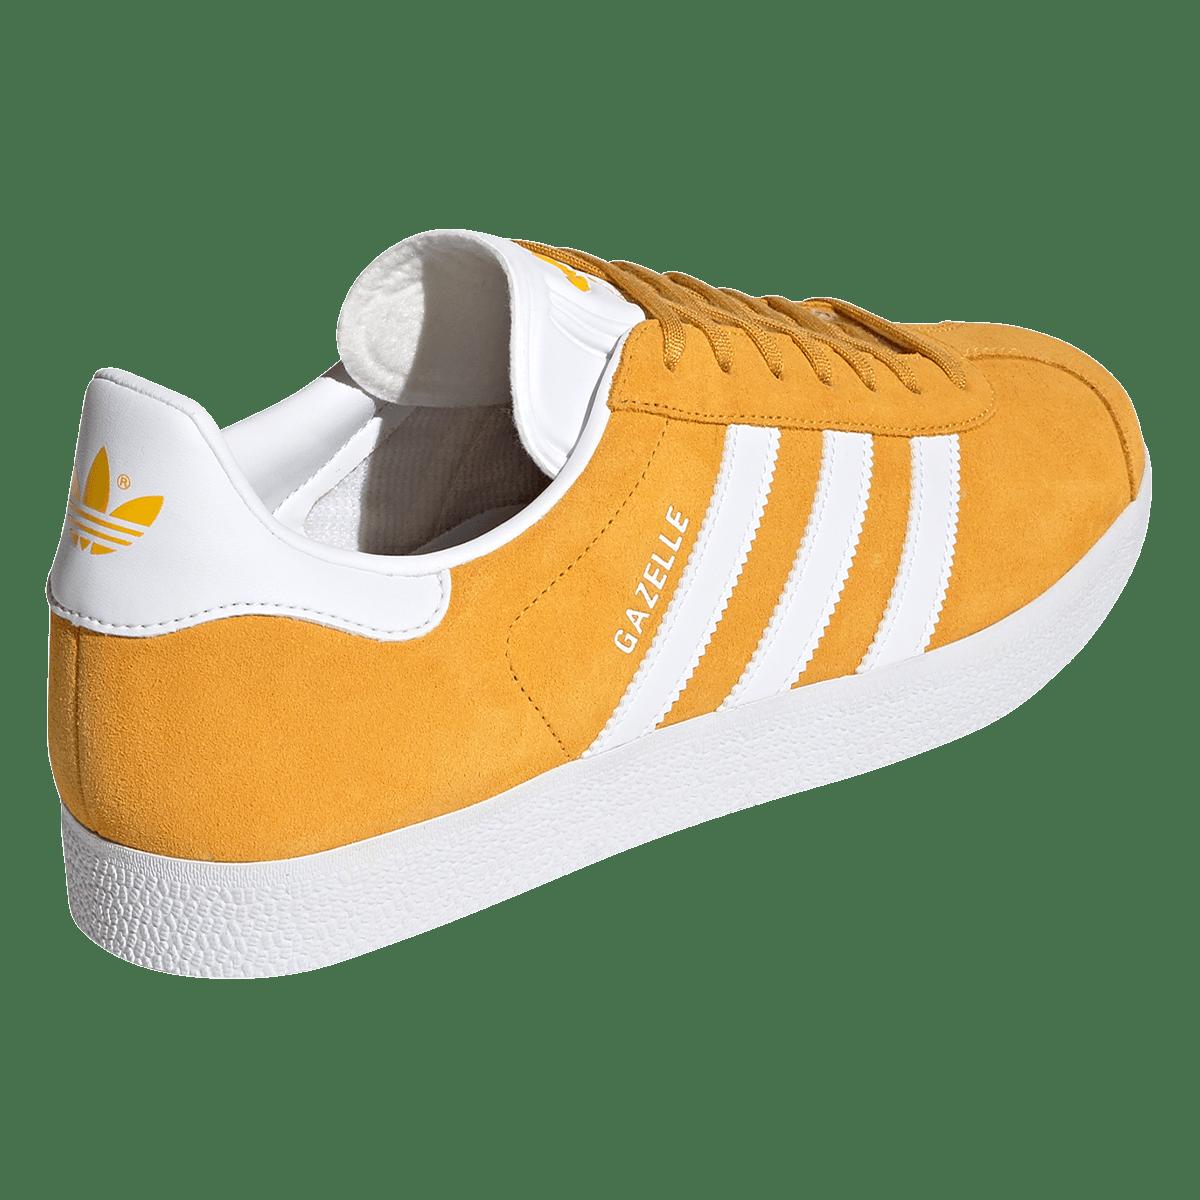 adidas Gazelle loisir chaussure jaune / blanc - Boutique football